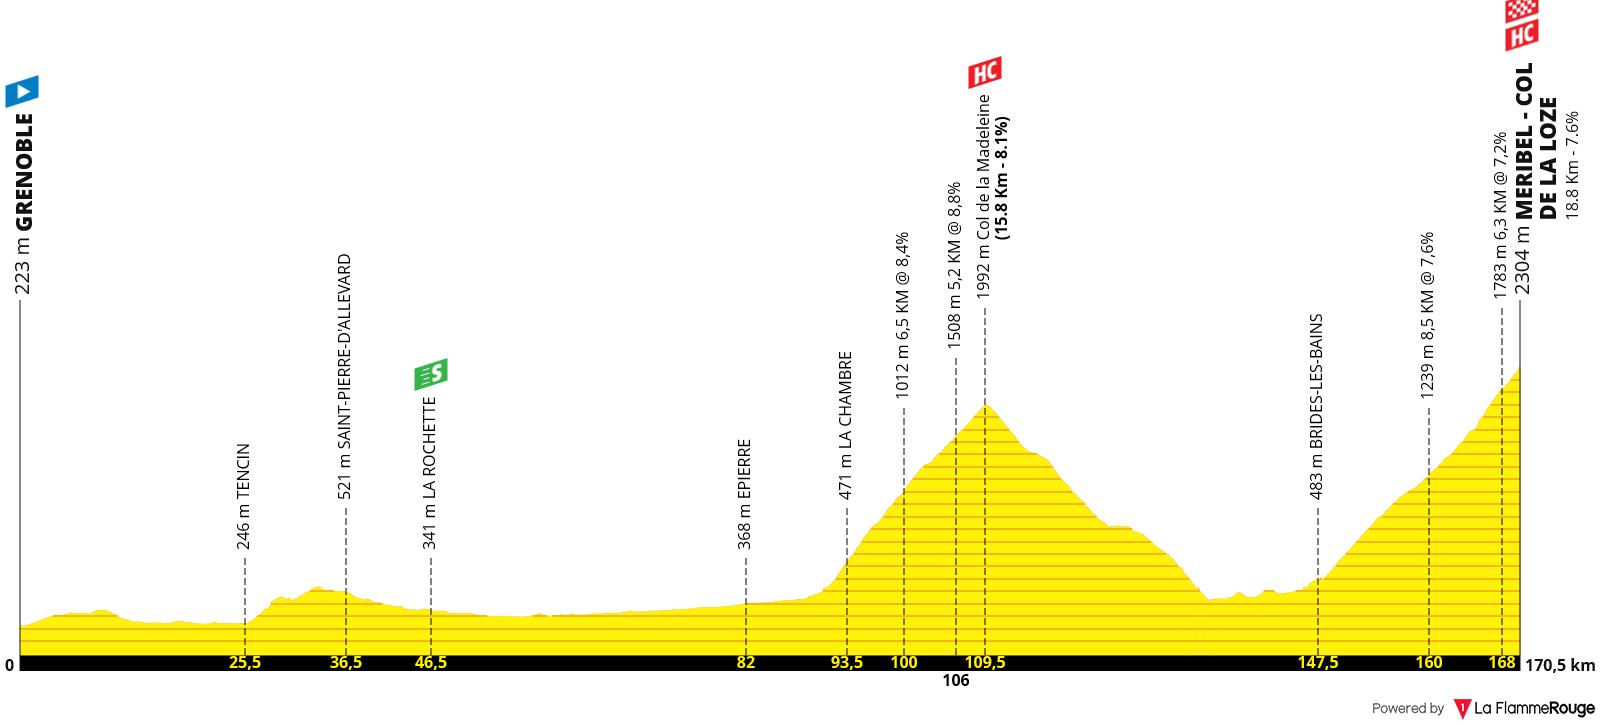 Perfil Etapa 18 - Tour de Francia 2020 - Méribel > La Roche-sur-Foron